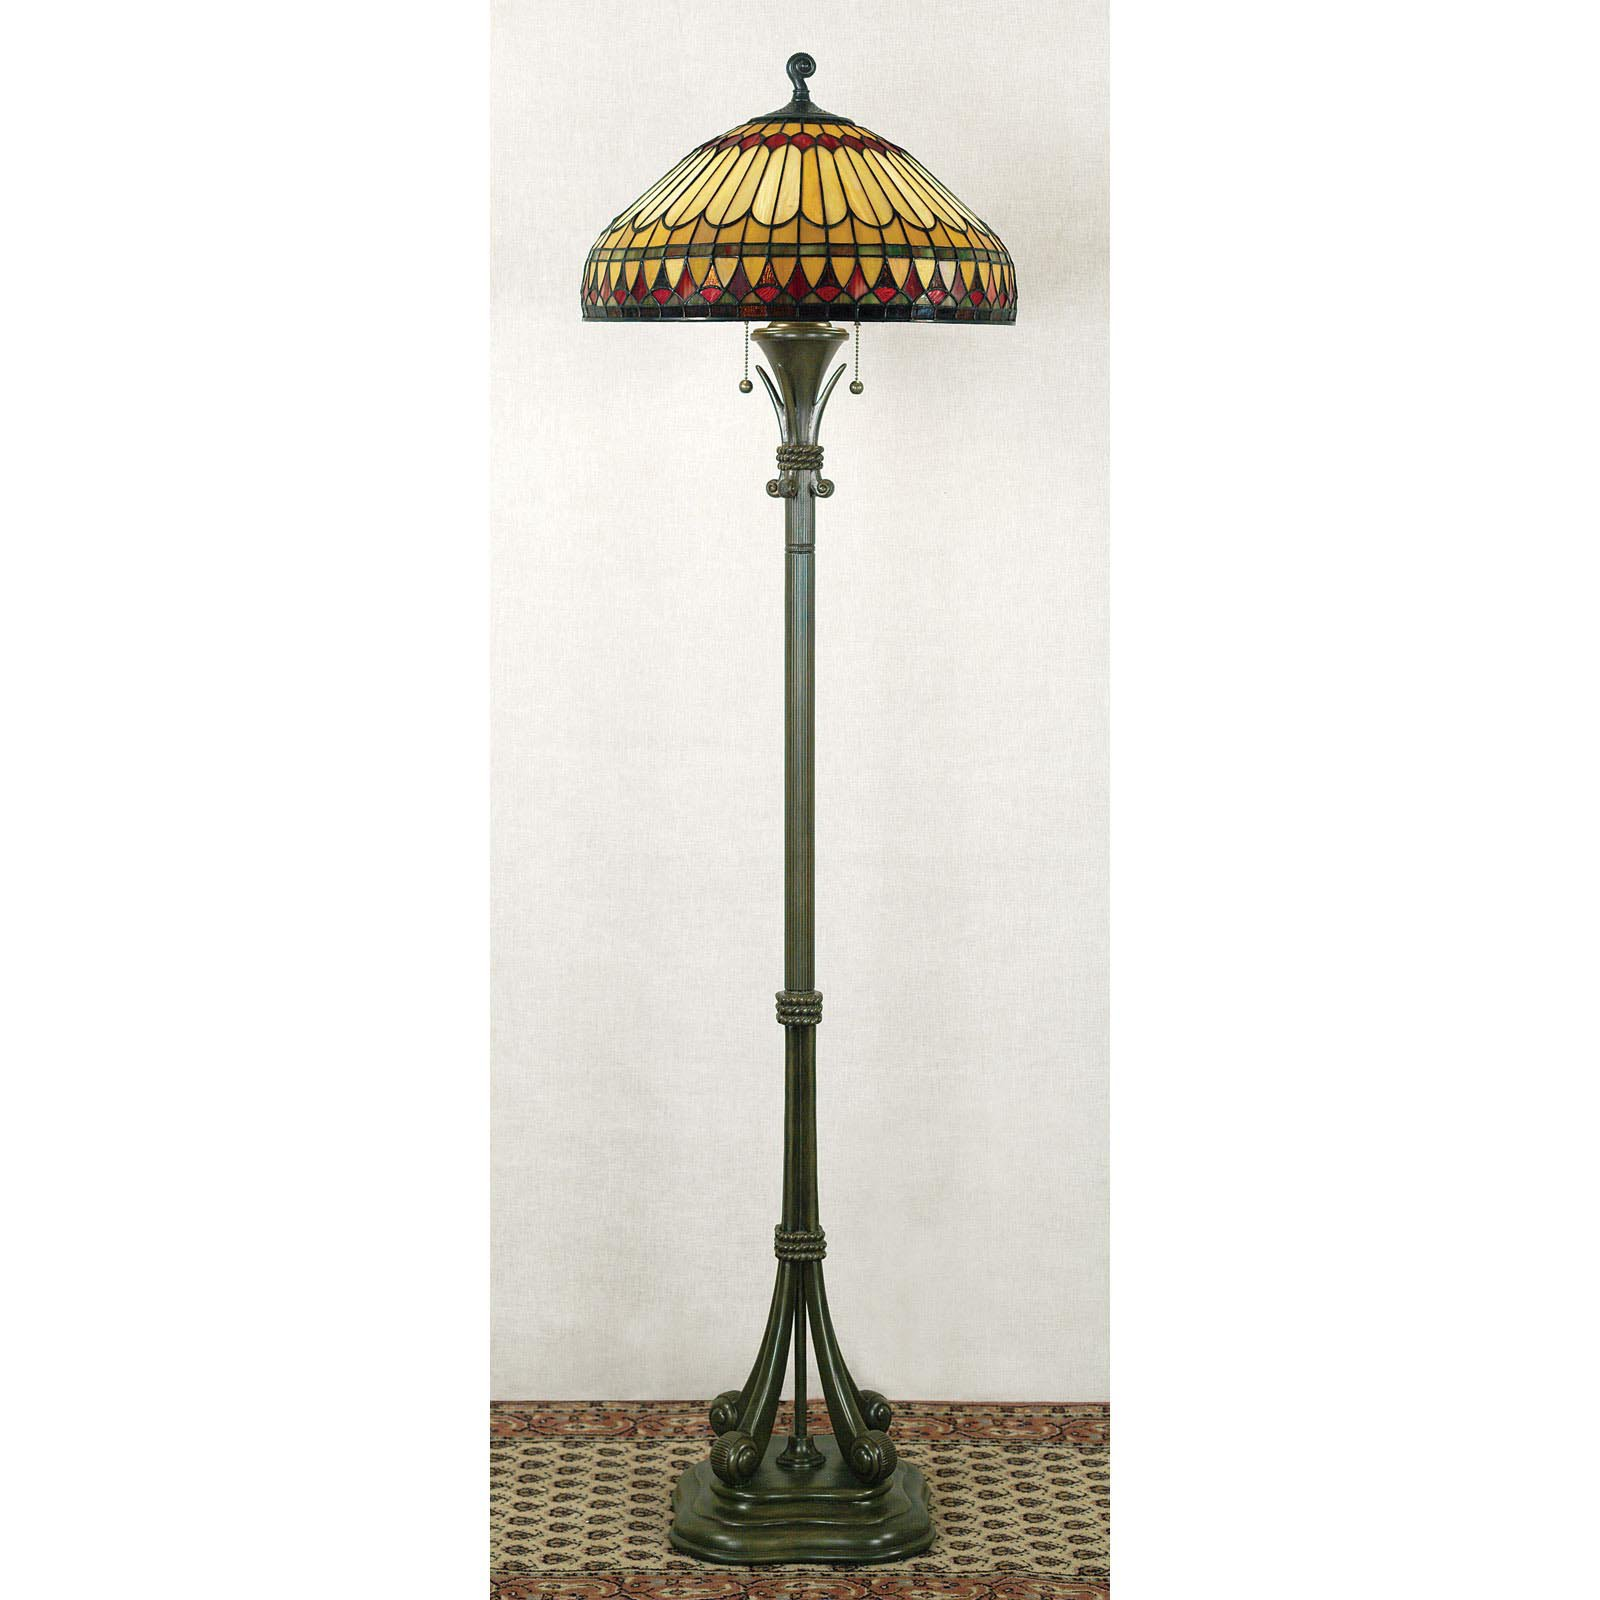 Quoizel West End Tf9320bb Tiffany Floor Lamp